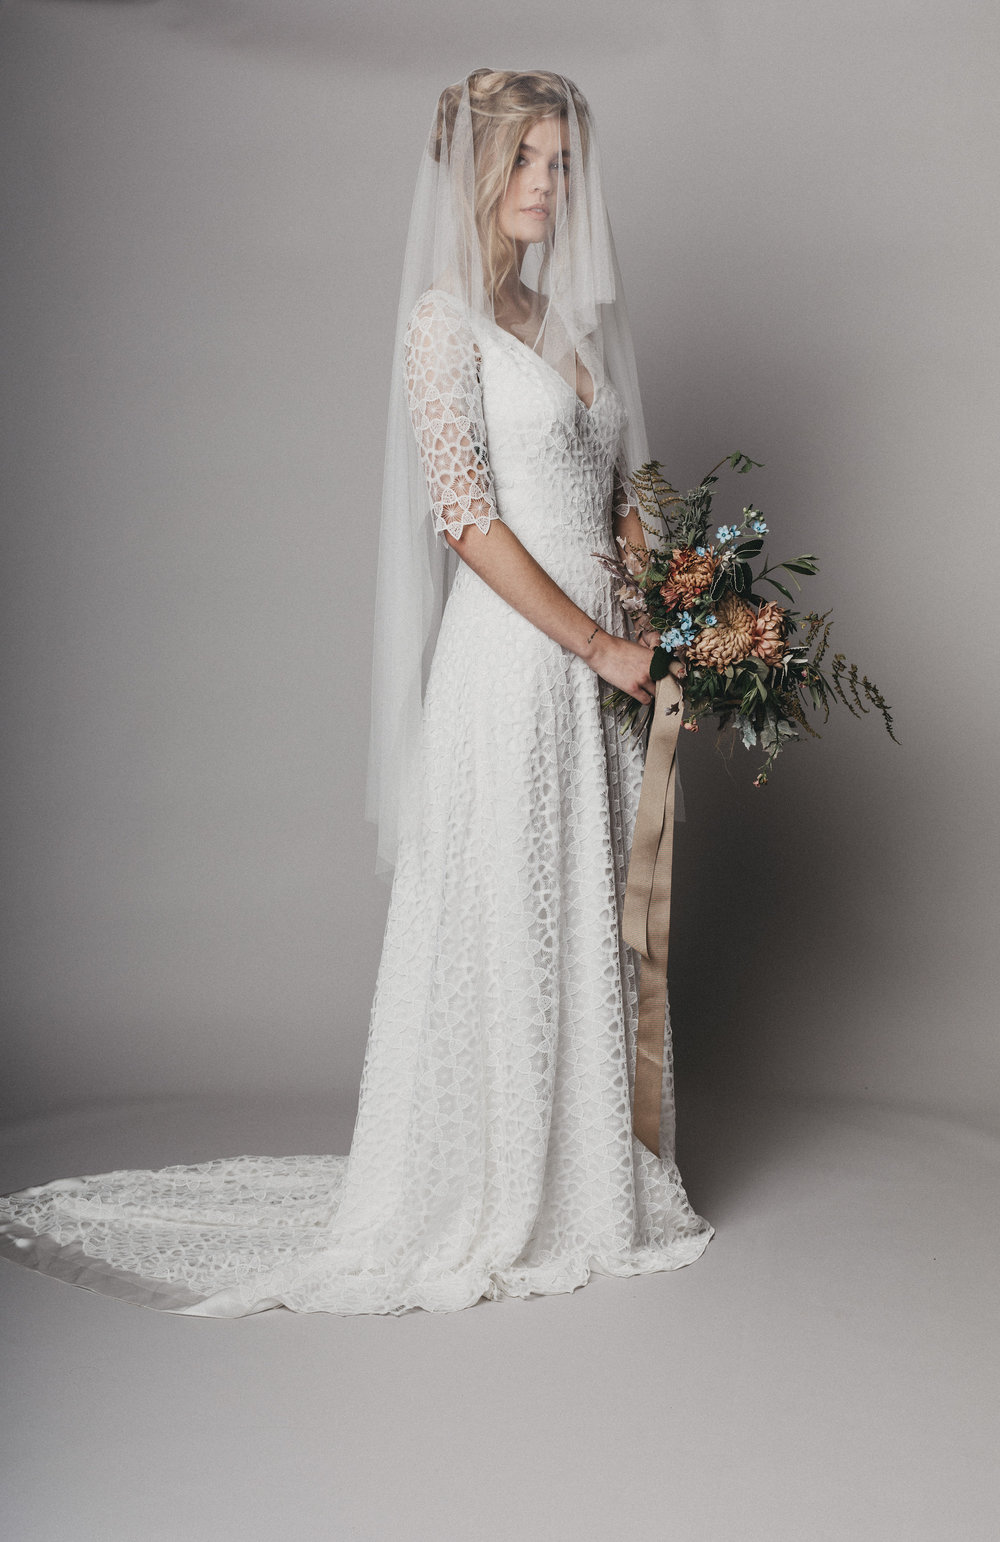 Rolling in Roses alternative wedding dress5.jpg